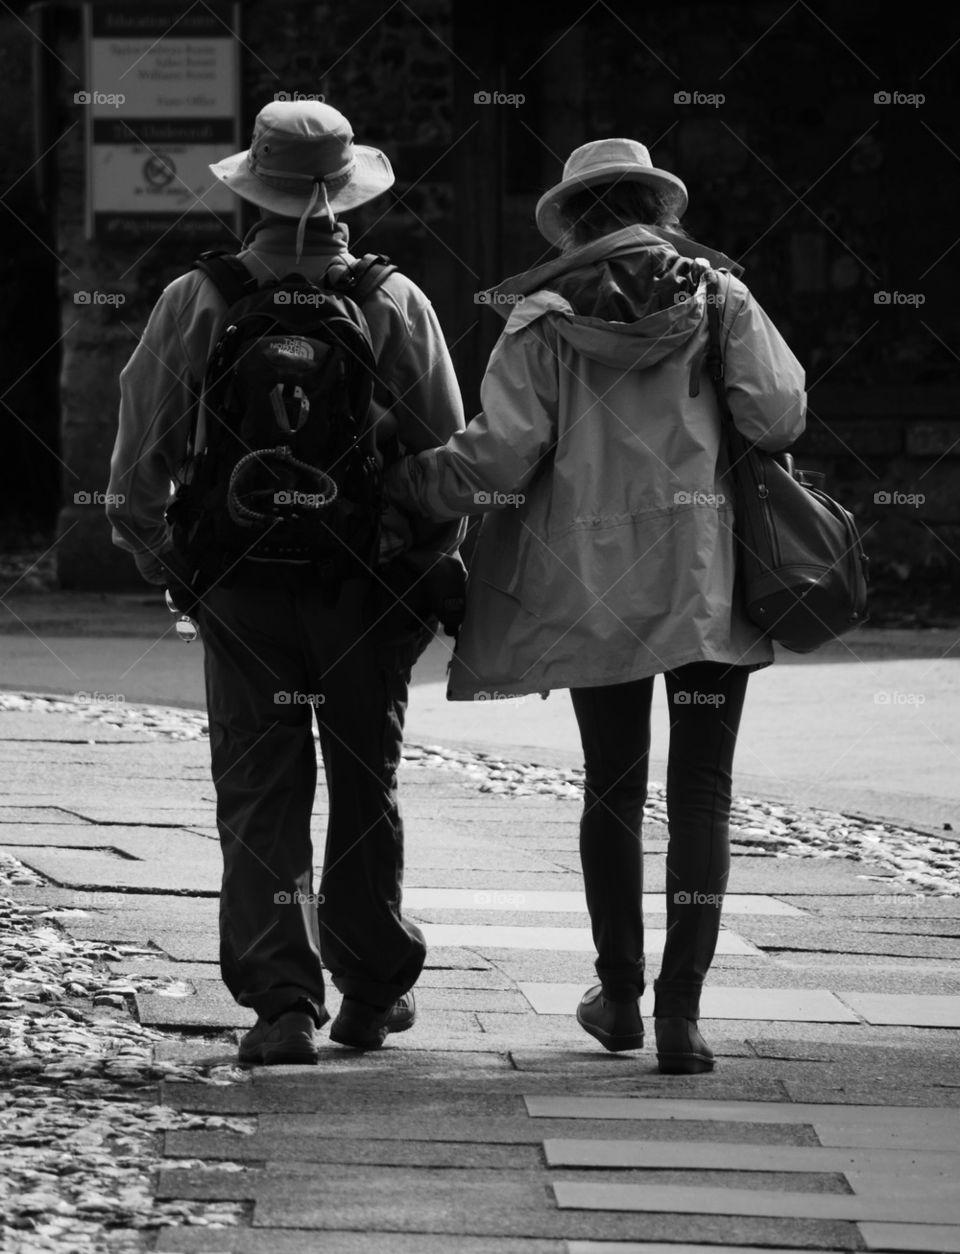 Afternoon stroll